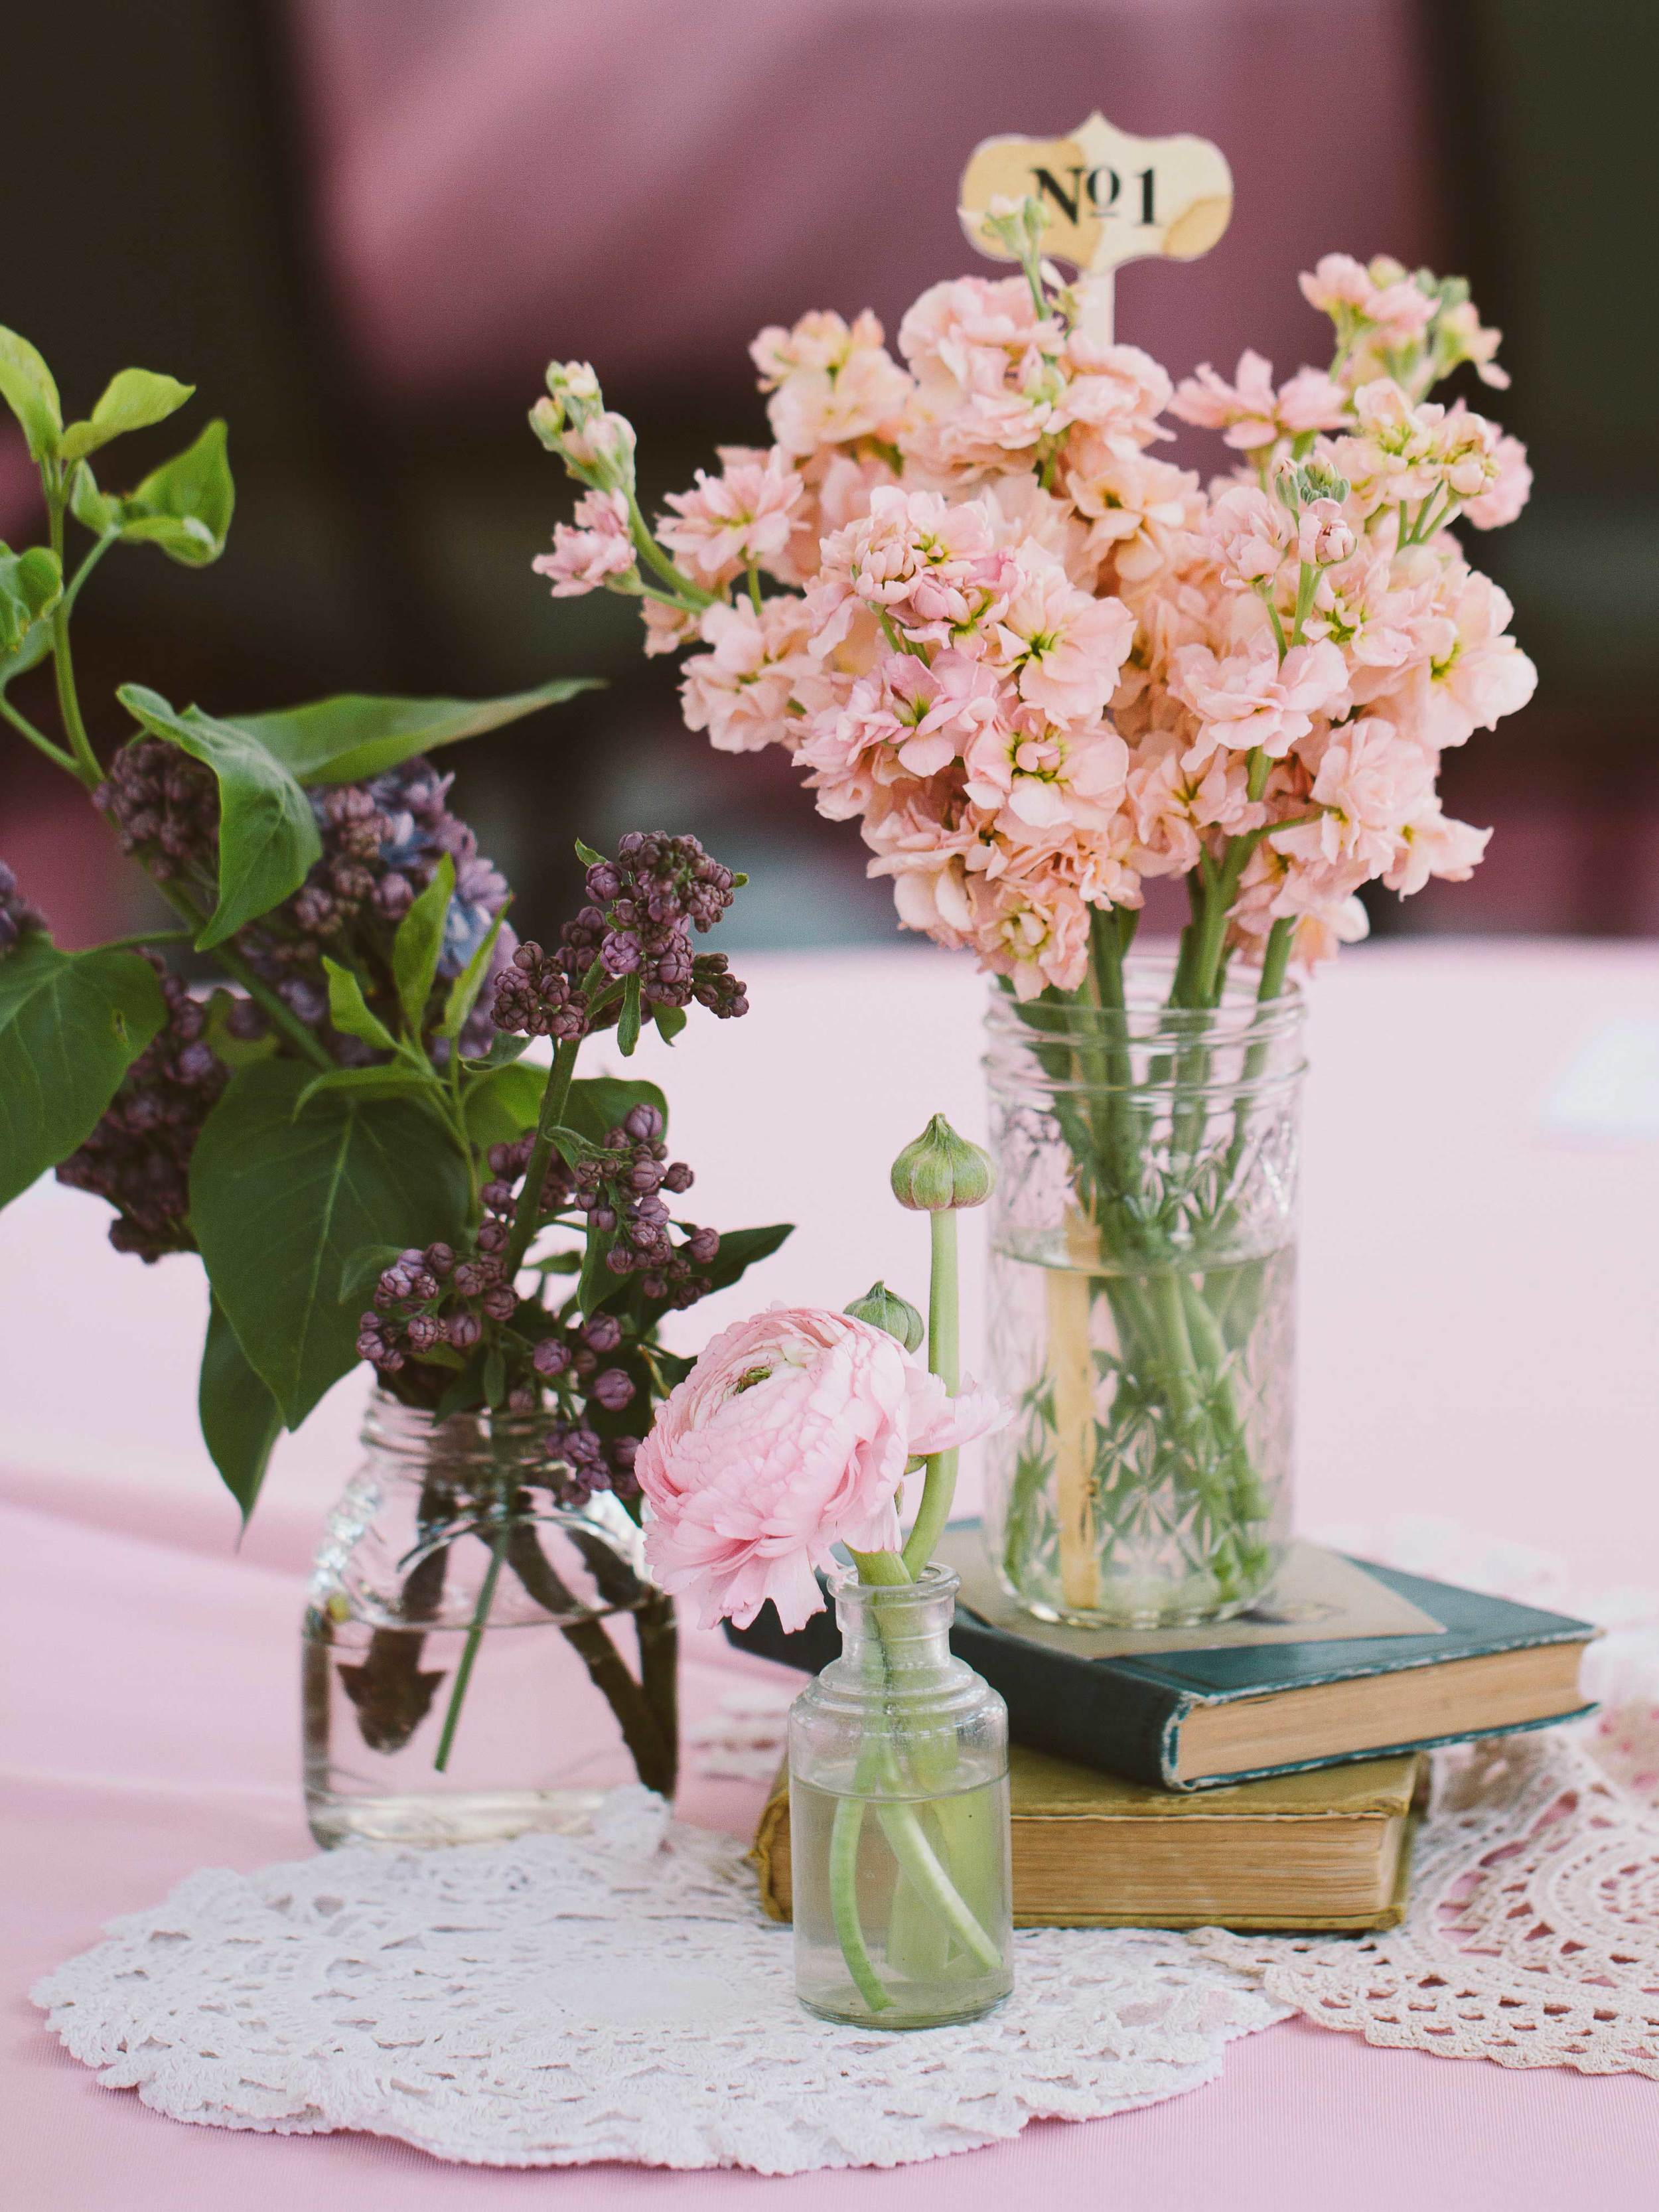 Radka-Wedding-Radka-April-18-2015-0396.jpg